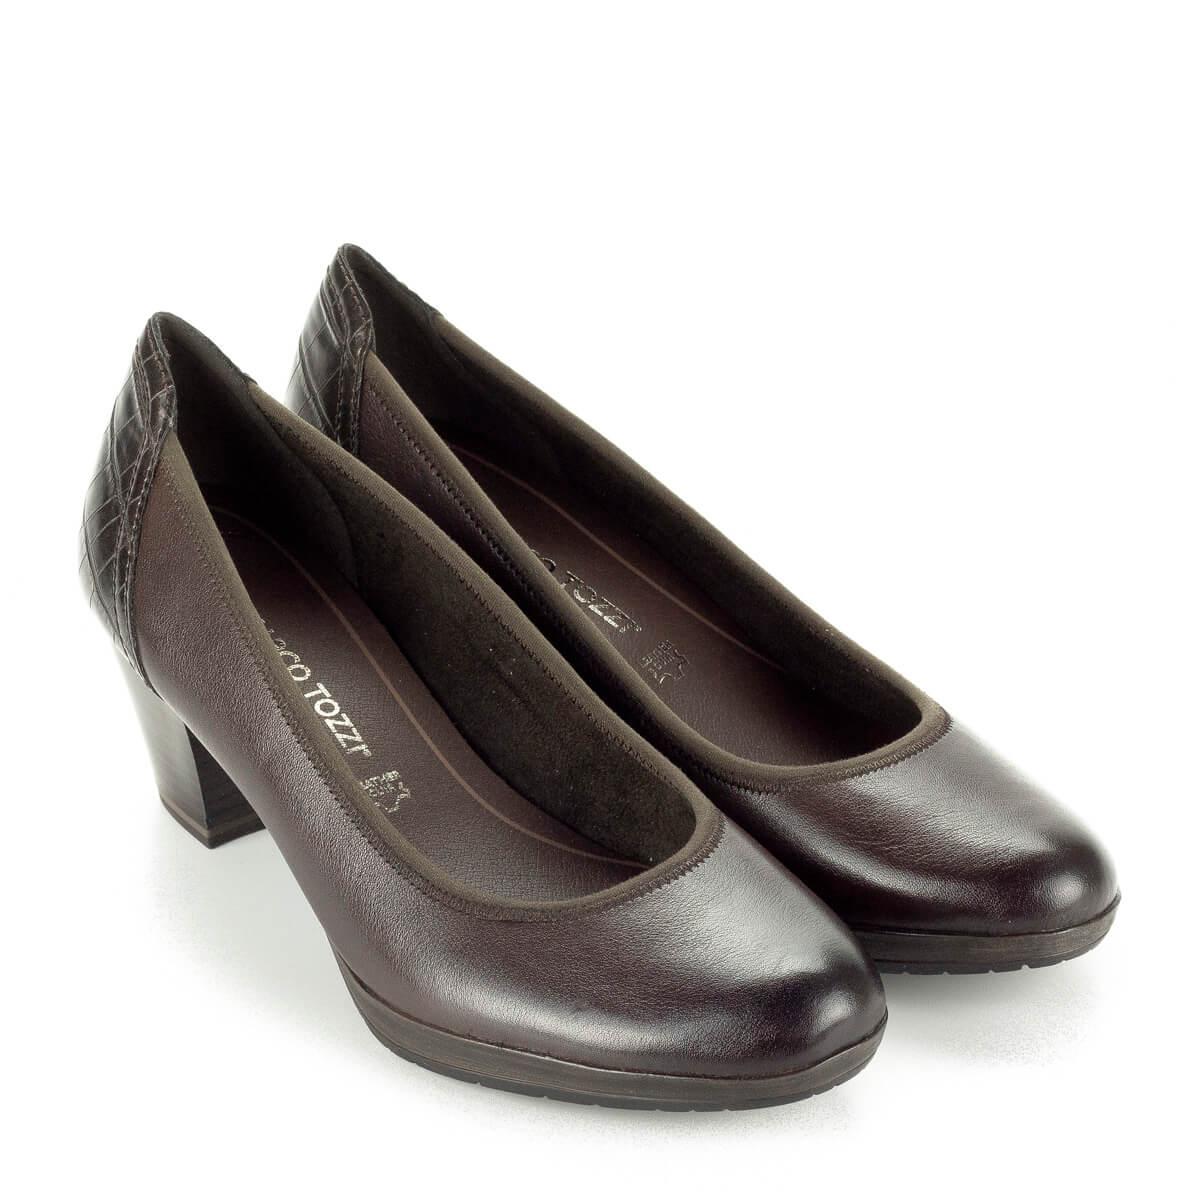 Marco Tozzi cipő AntiShokk sarokkal b9523fc2f5